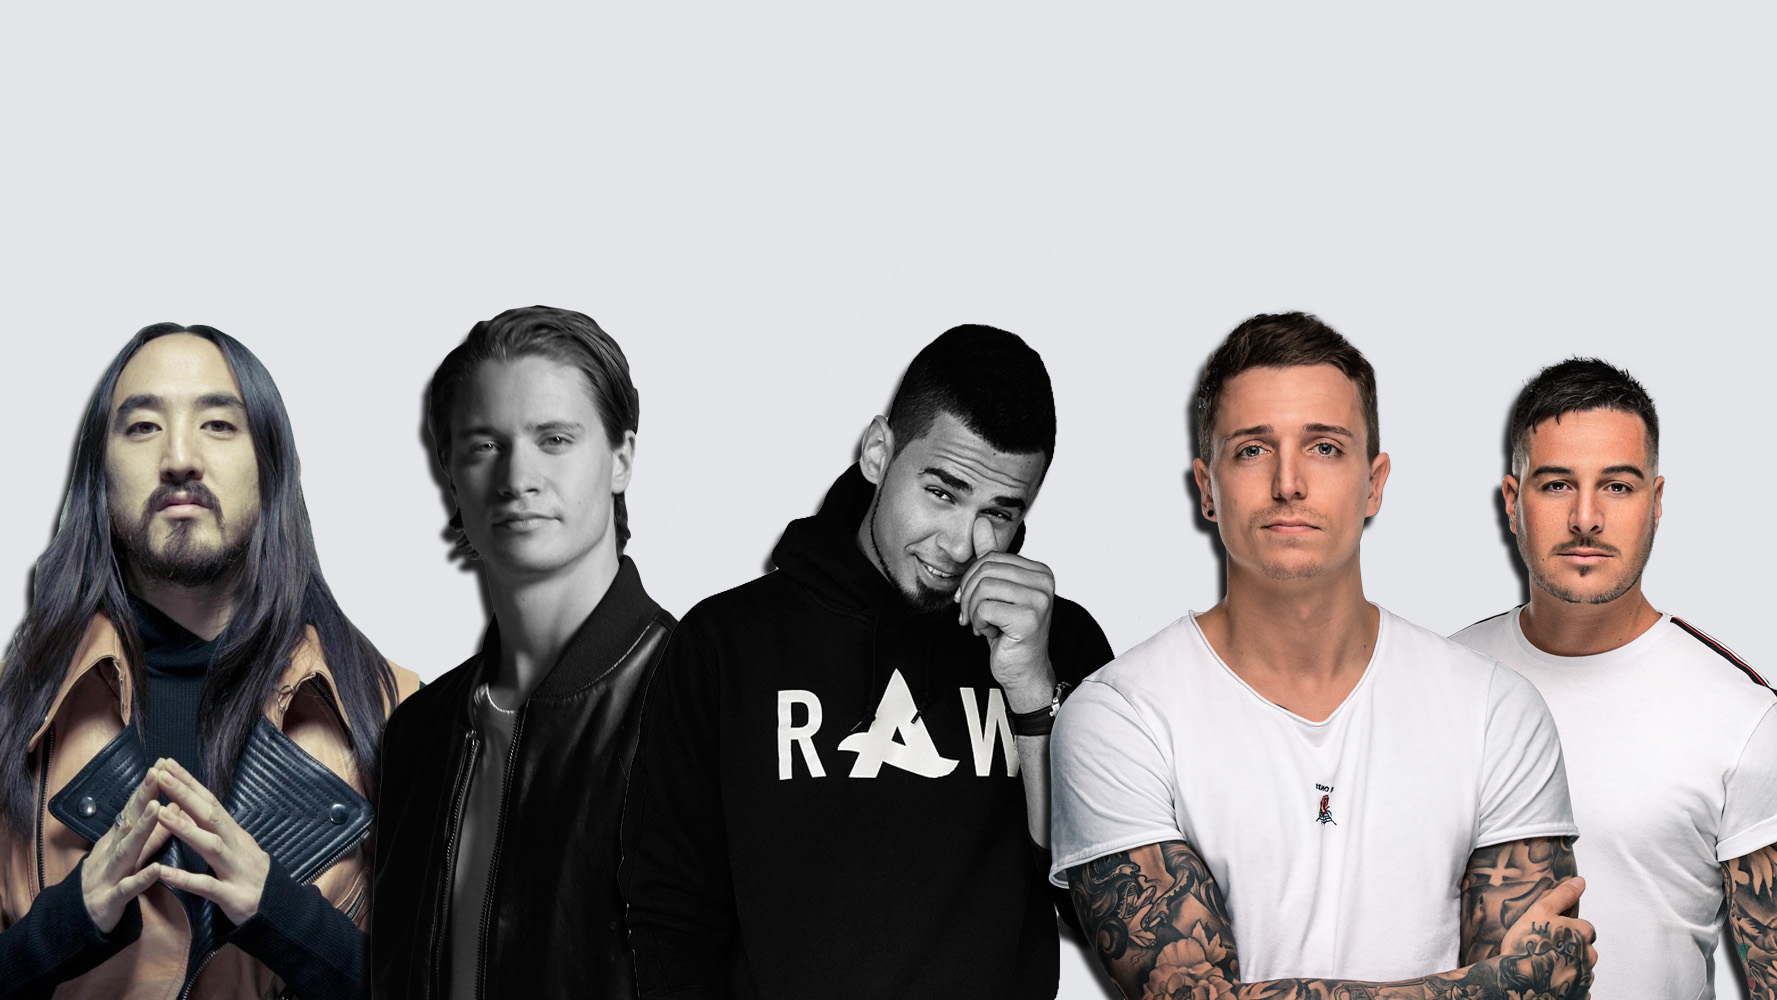 New Music Friday: Kygo, Blasterjaxx, Afrojack, Steve Aoki & More!